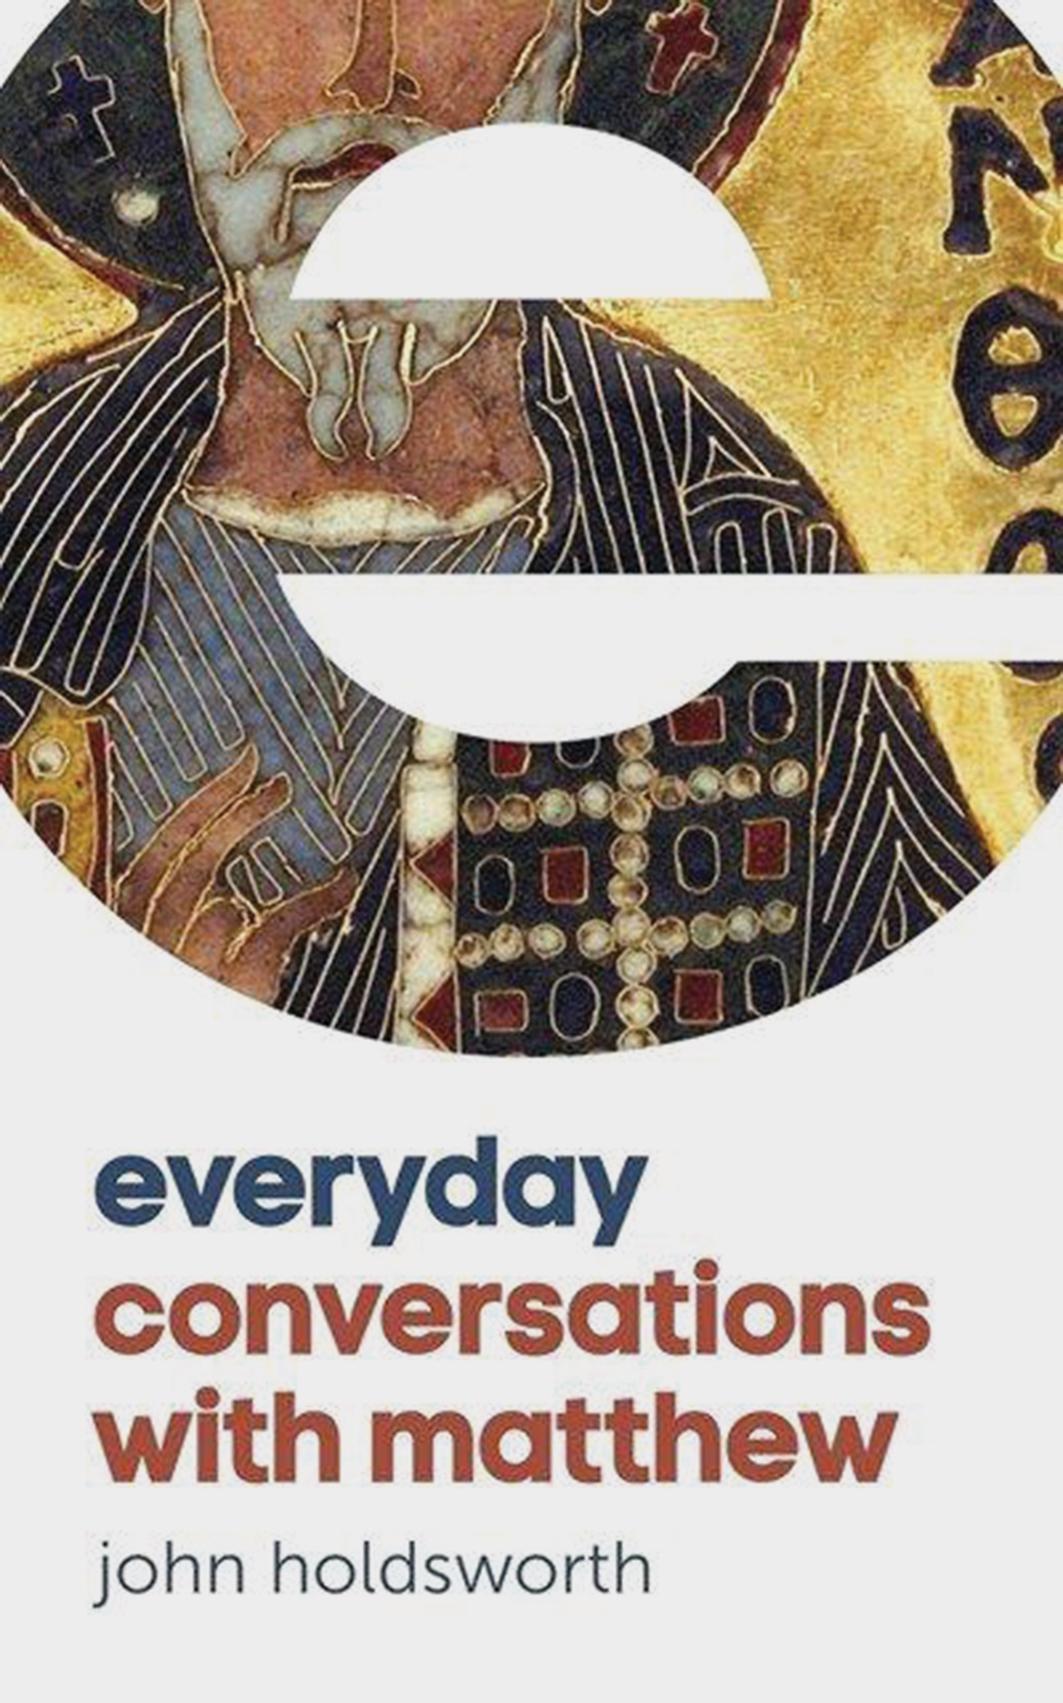 Everyday conversations with Matthew